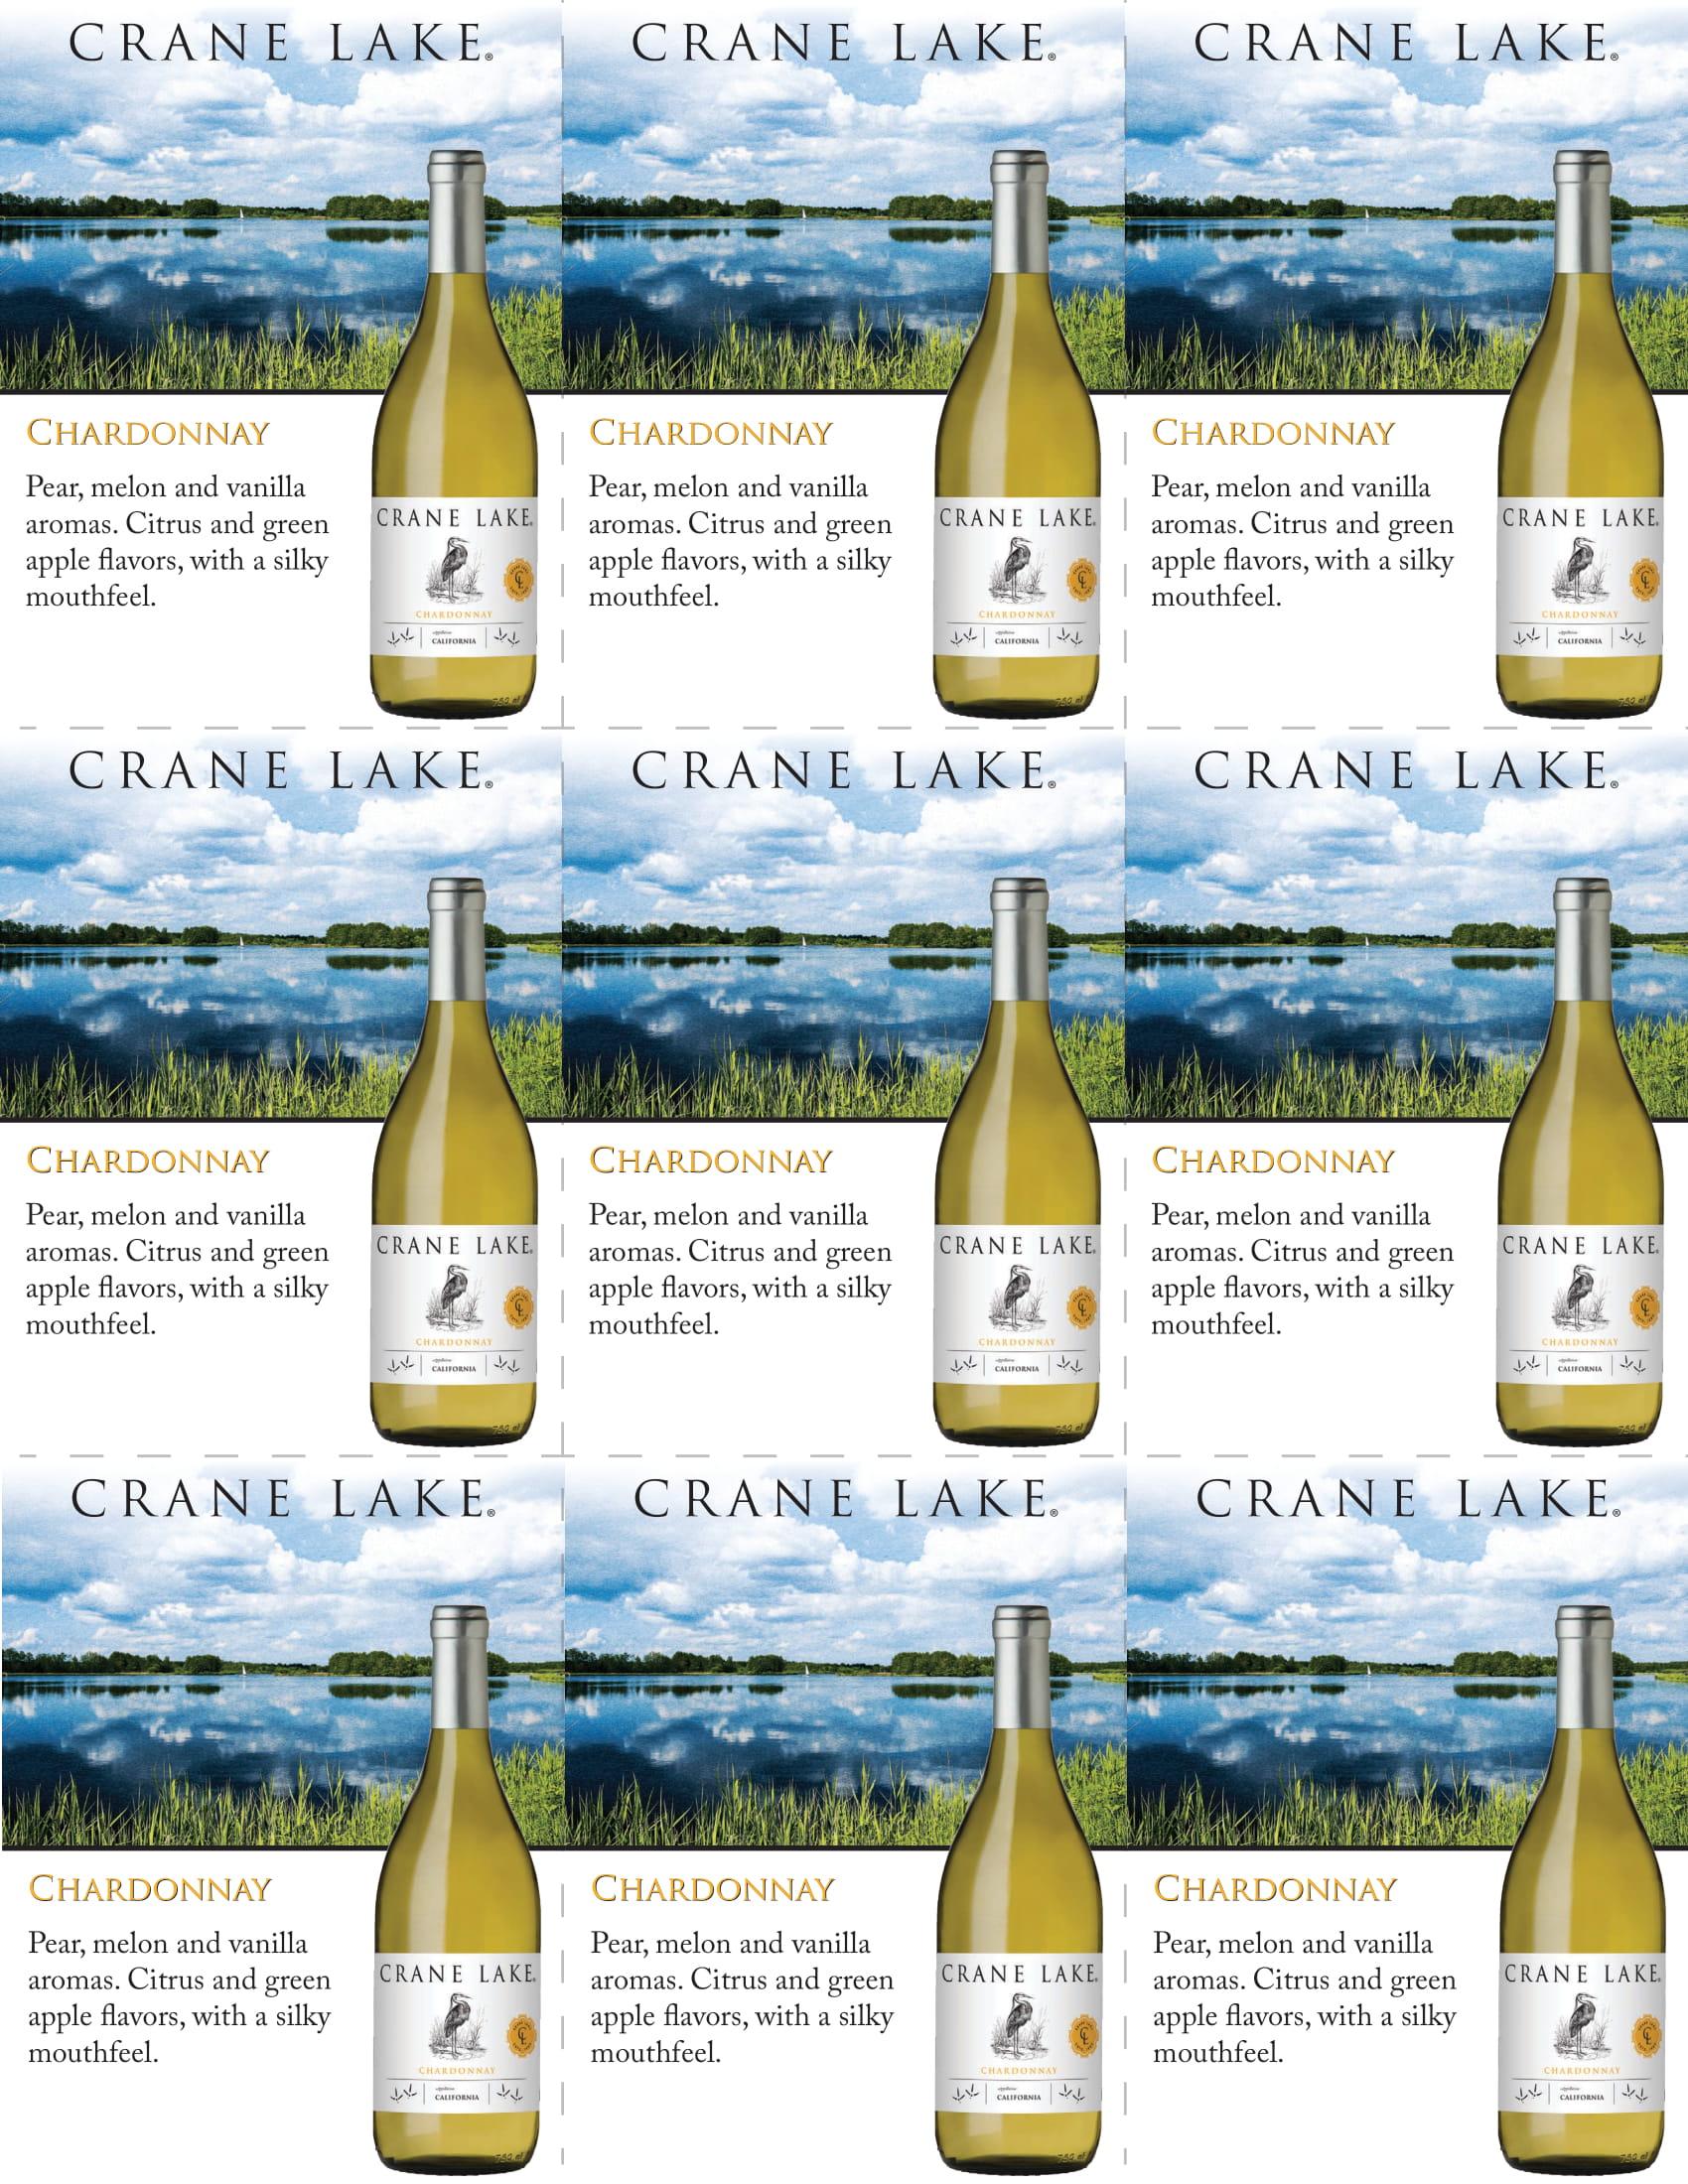 Crane Lake Chardonnay Shelf Talkers